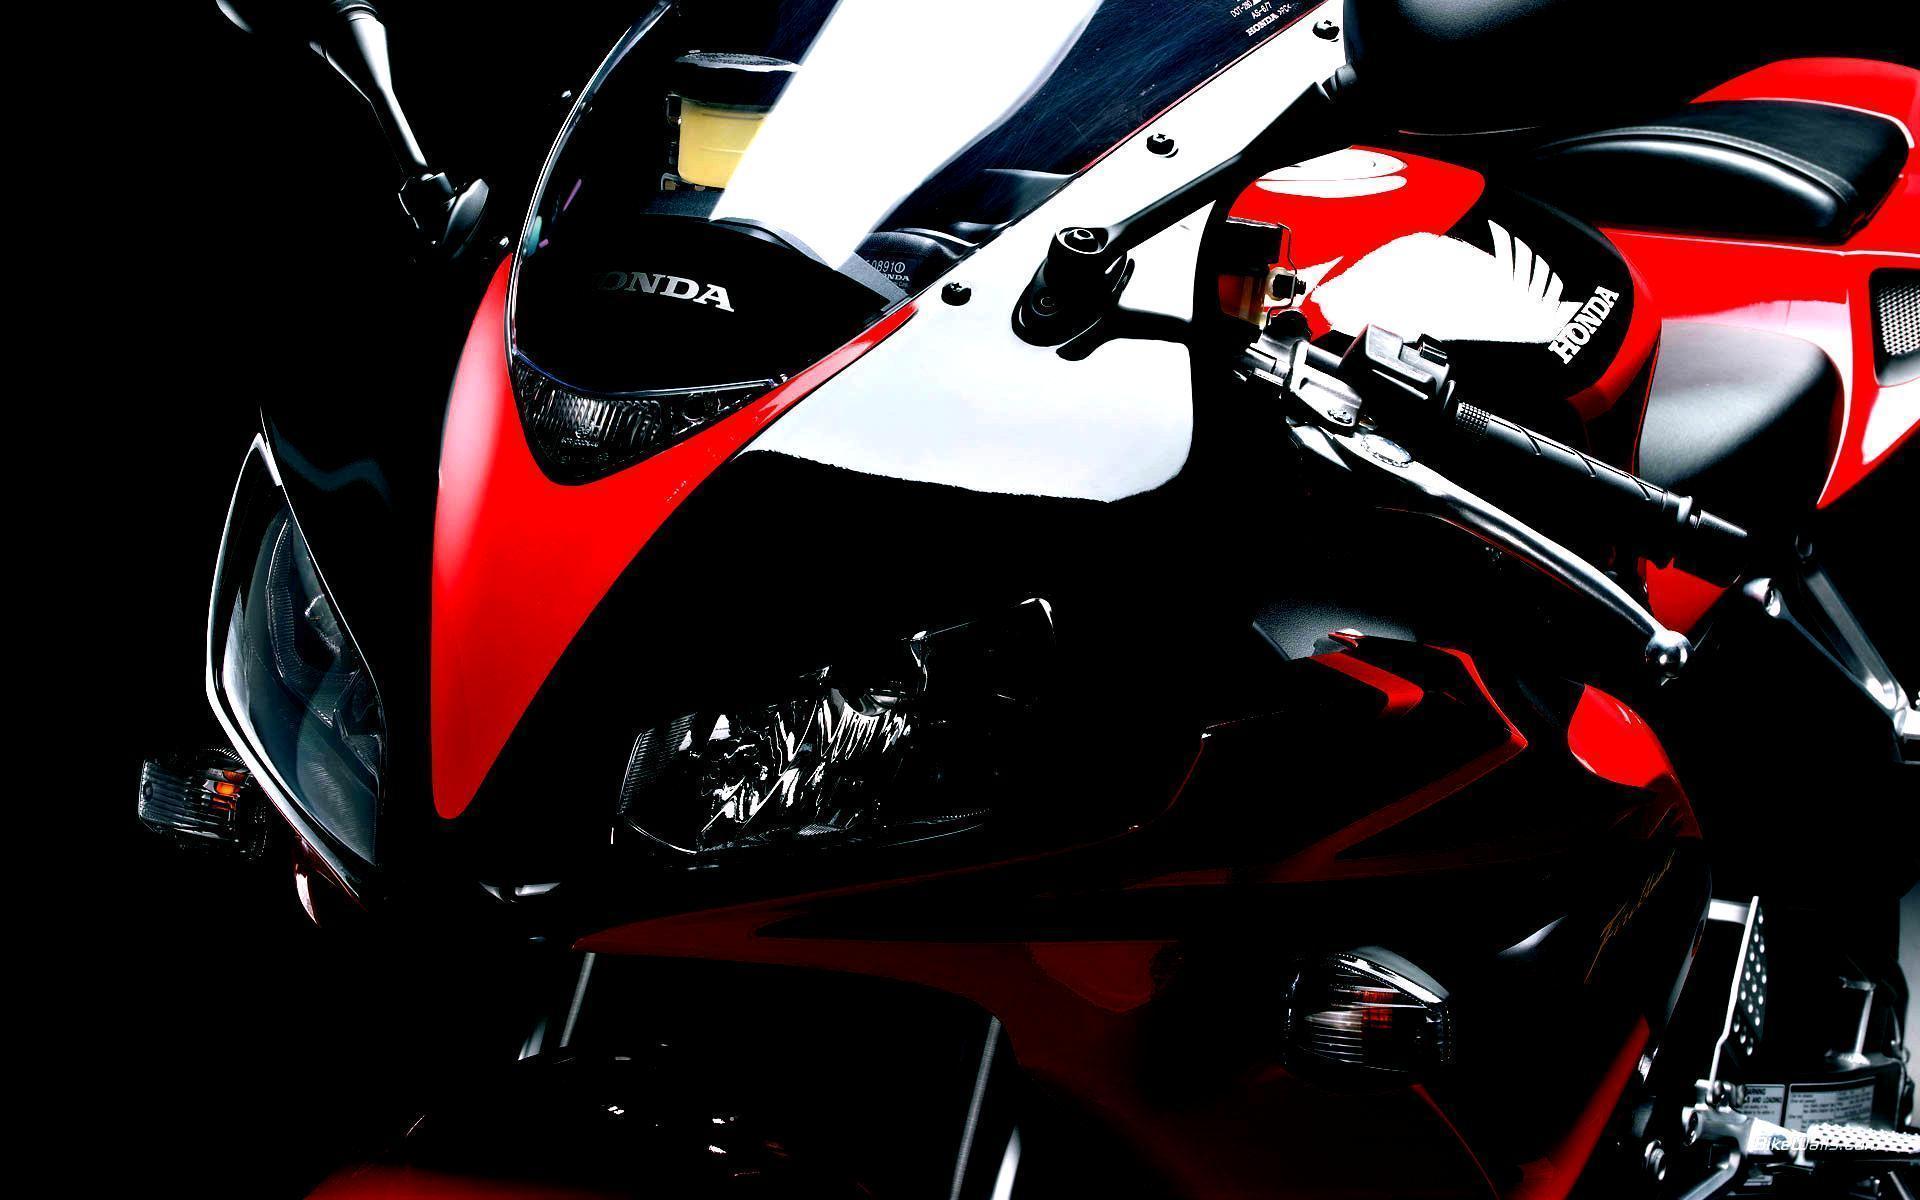 motor sports full hd - photo #6